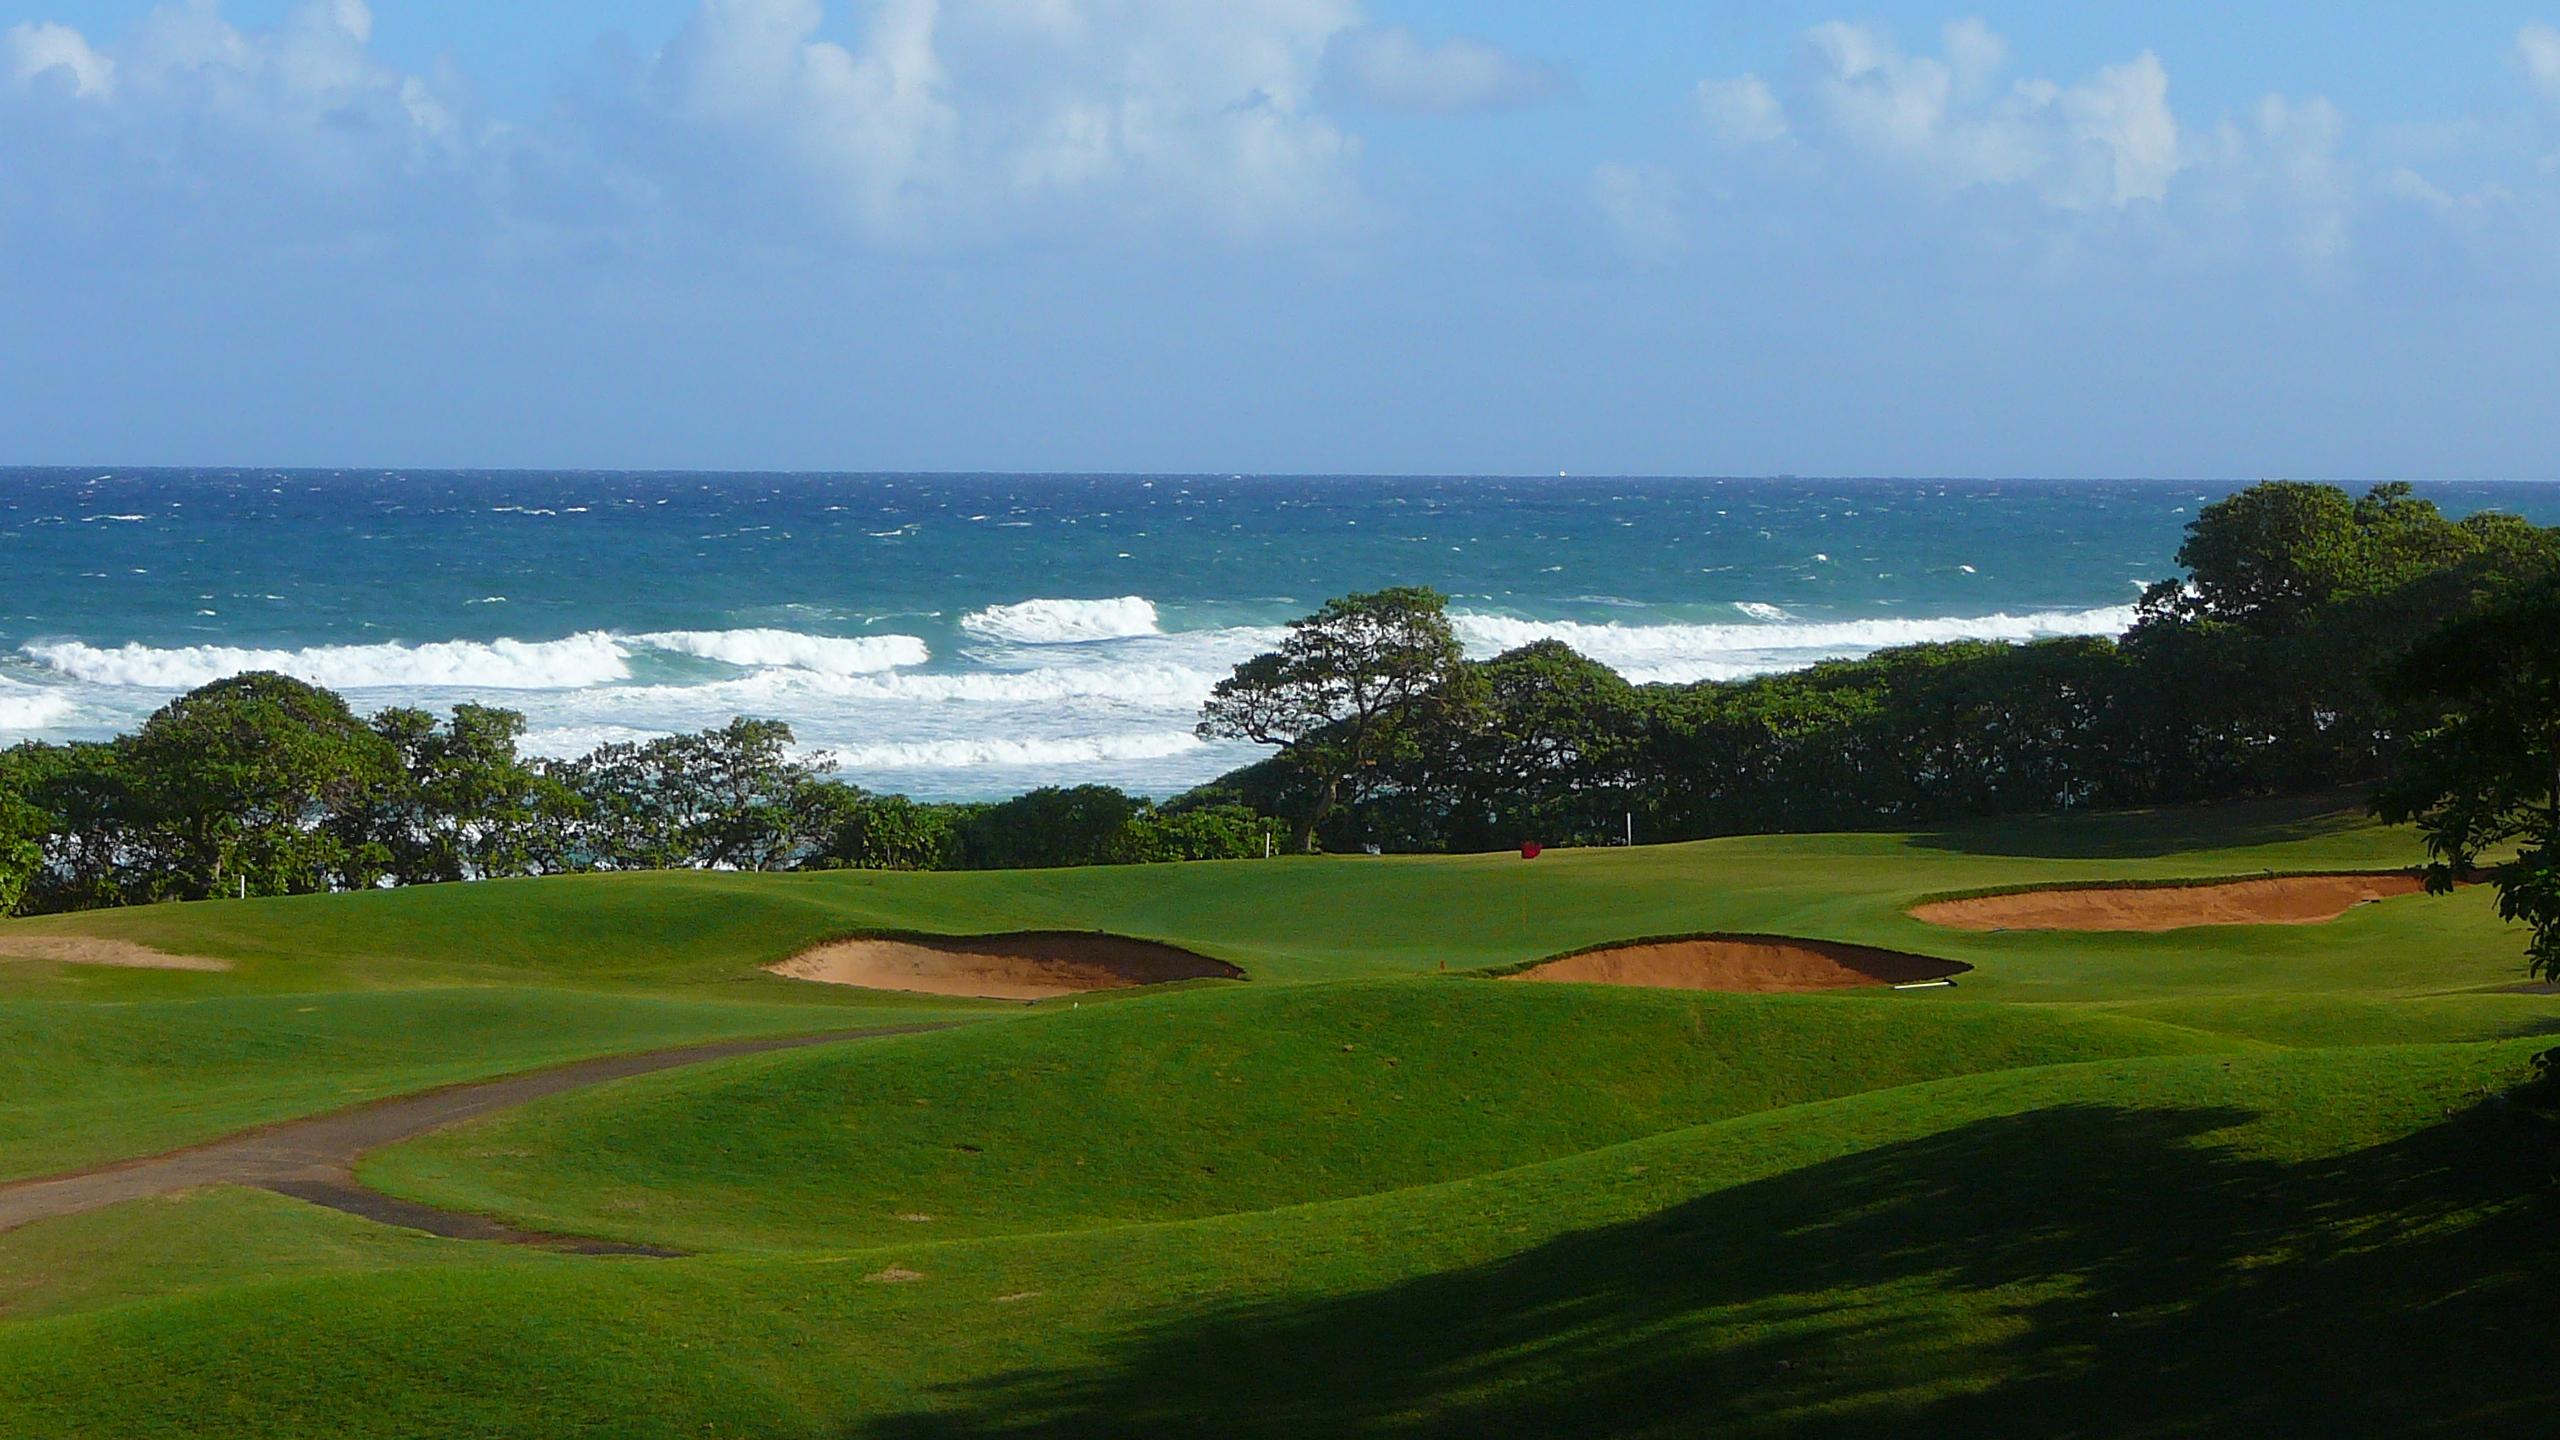 Hawaii Golf paquetes de vacaciones, Maui Paquete de Golf, Kauai Paquete de Golf, Big Island Golf Package,